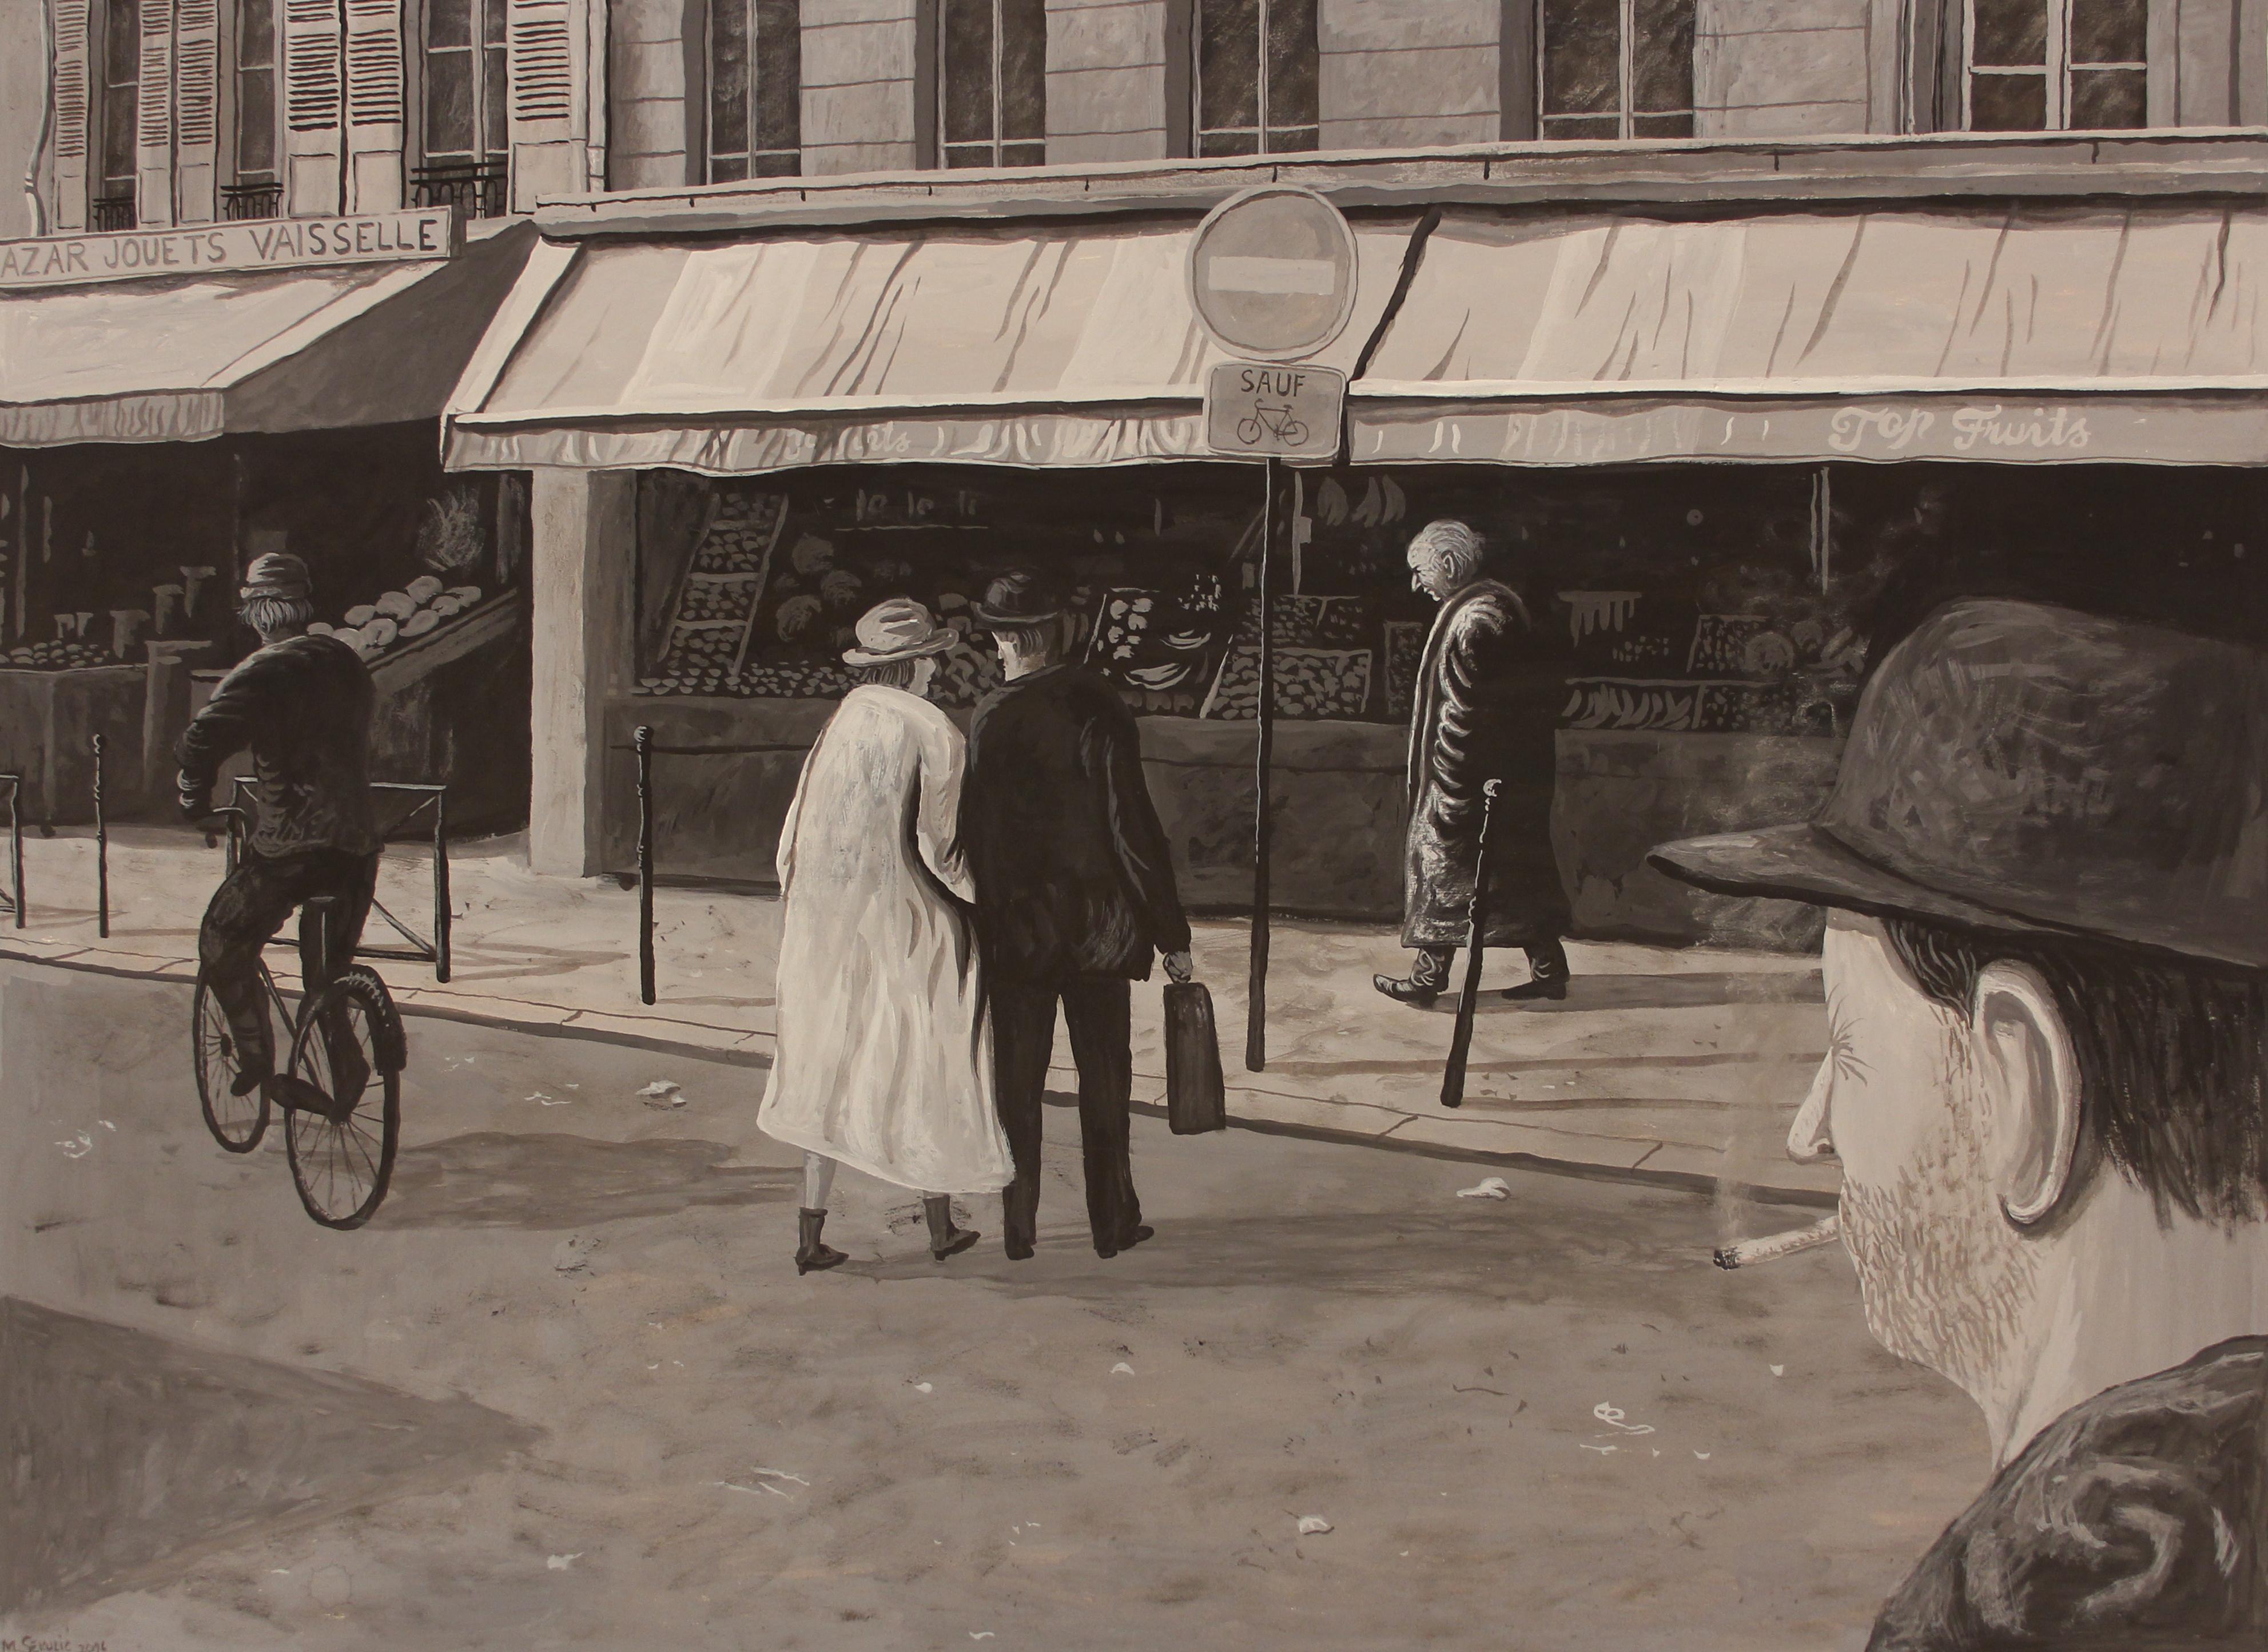 MIROSLAV SEKULIC STRUJA : PARIS 31 | GALERIE TREIZE-DIX I PARIS 31 | MIROSLAV SEKULIC-STRUJA